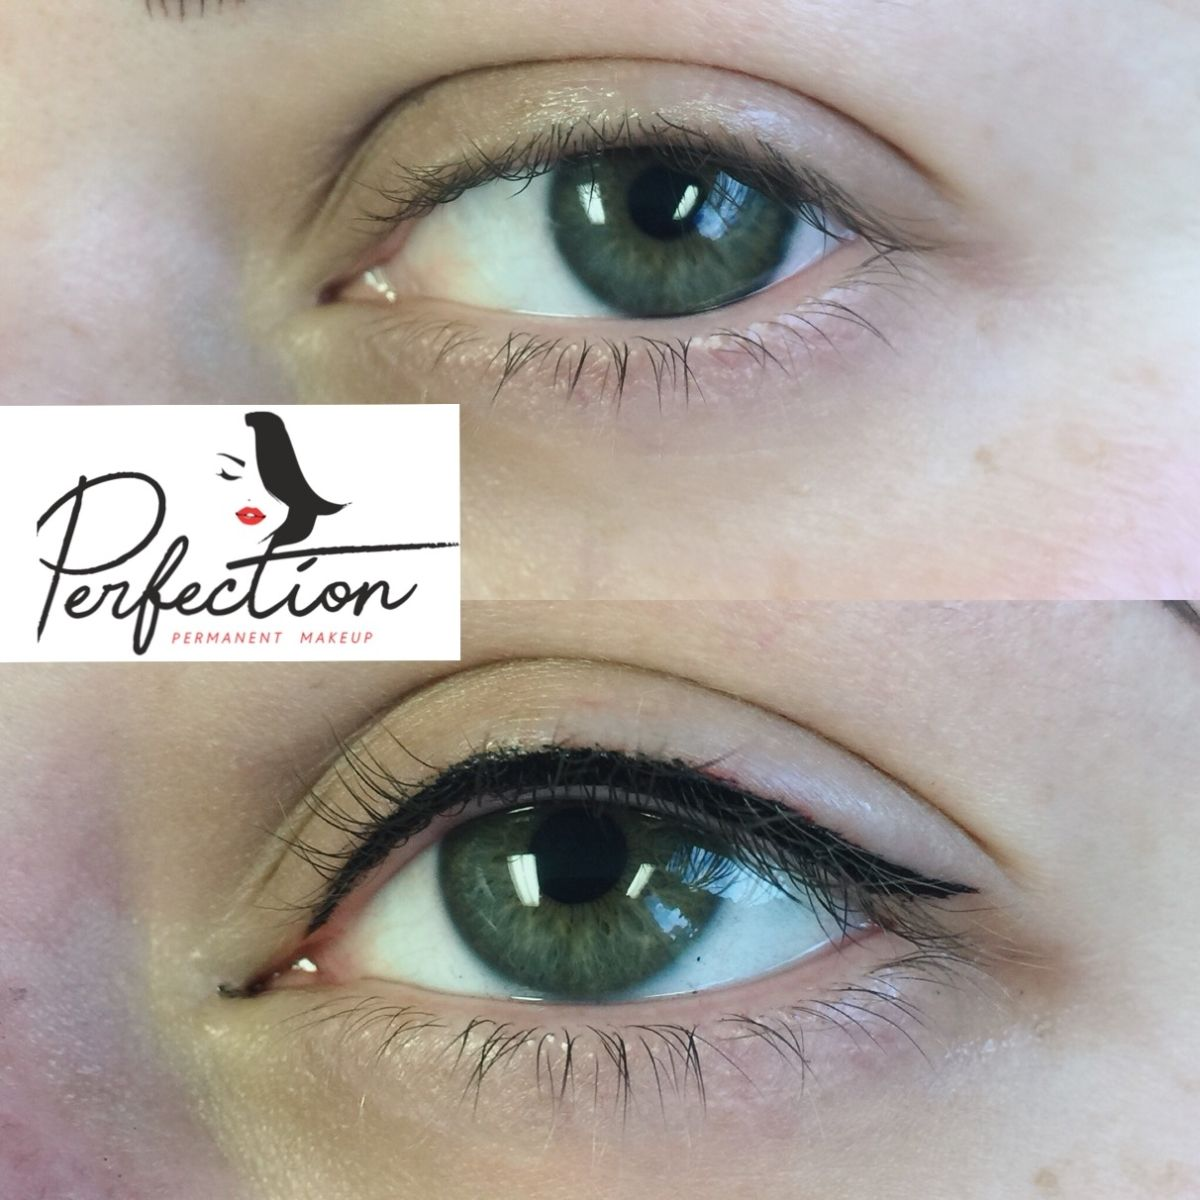 IMG_4310 (2) Permanent makeup eyeliner, Permanent makeup